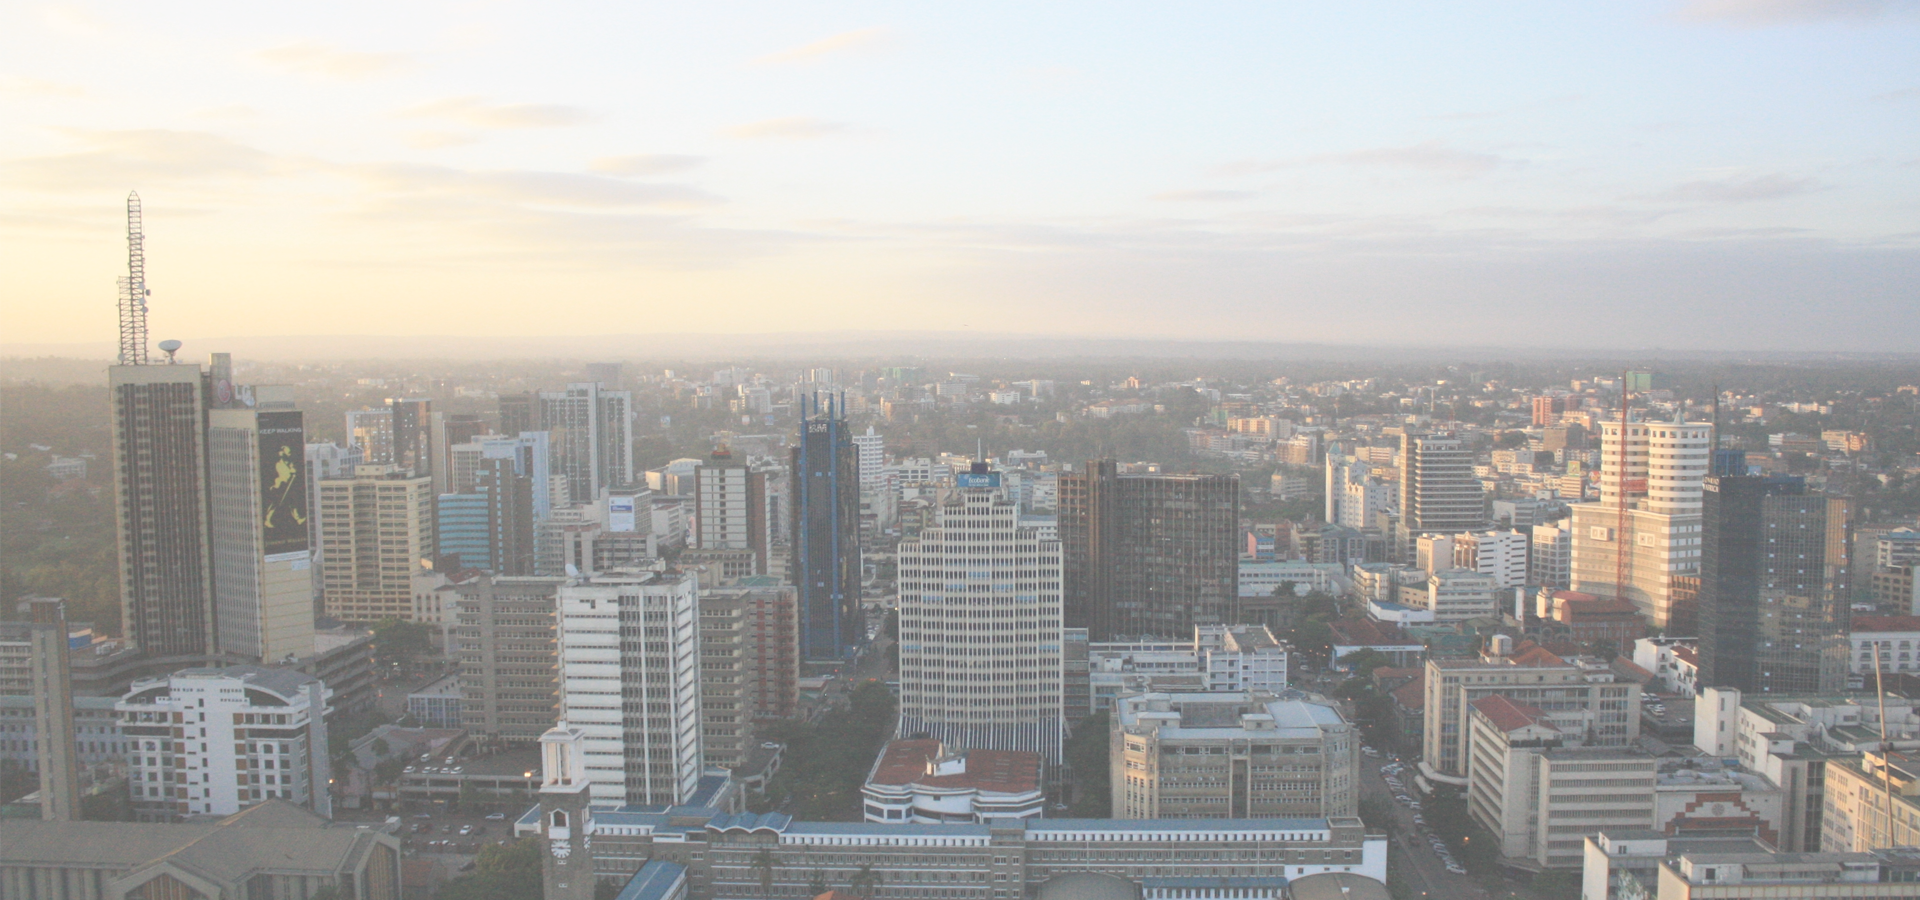 Peer-to-peer advisory in Mombasa, Coast Province, Kenya